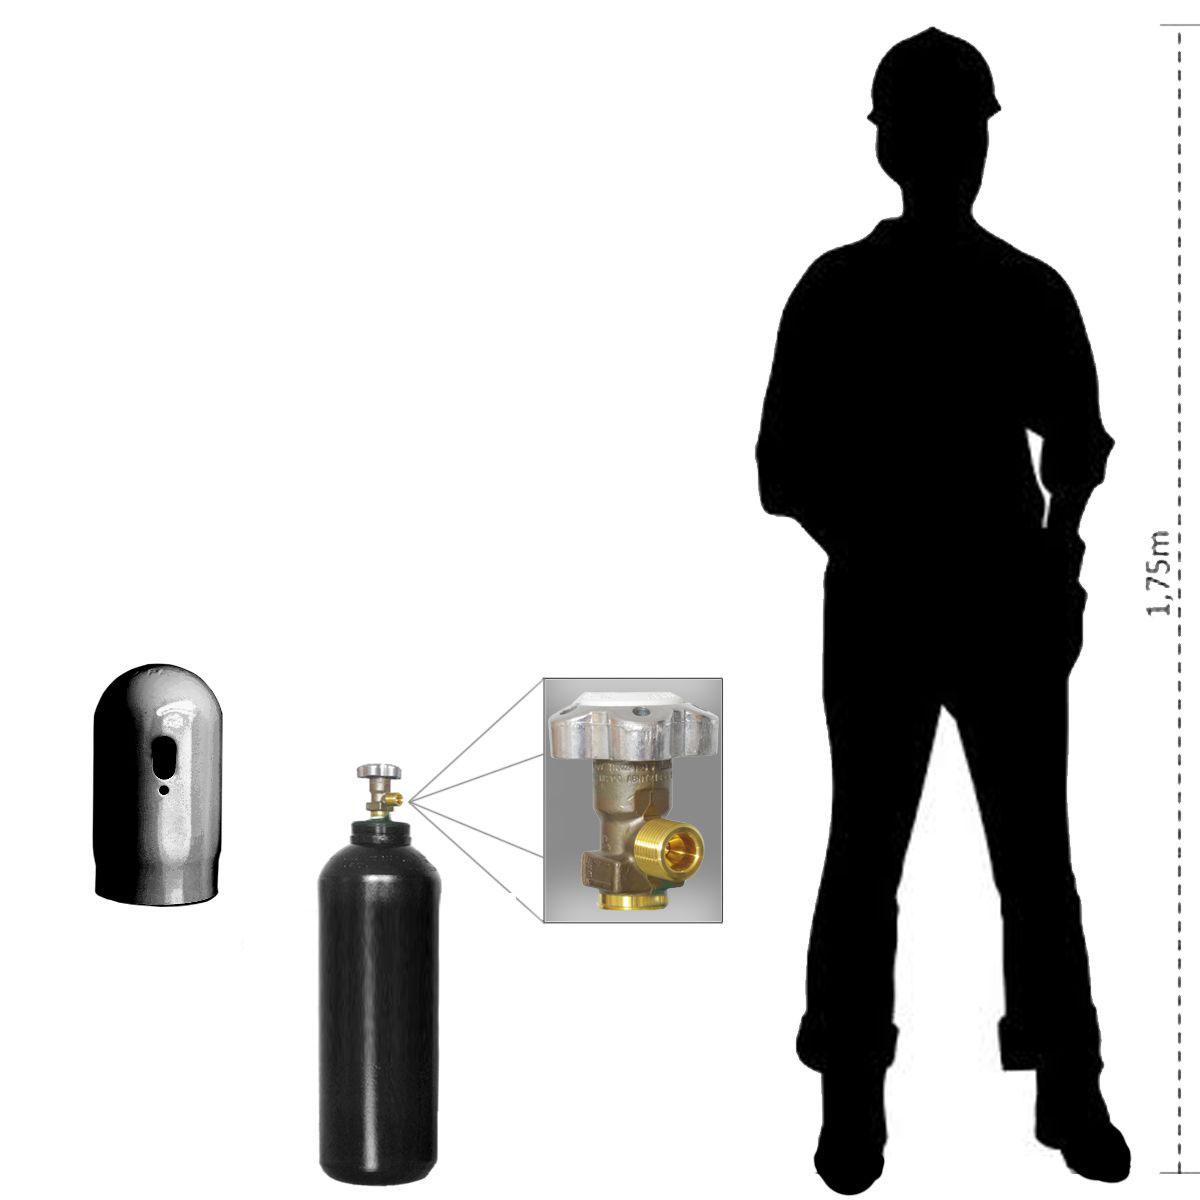 Cilindro para Oxigênio Industrial - 7L